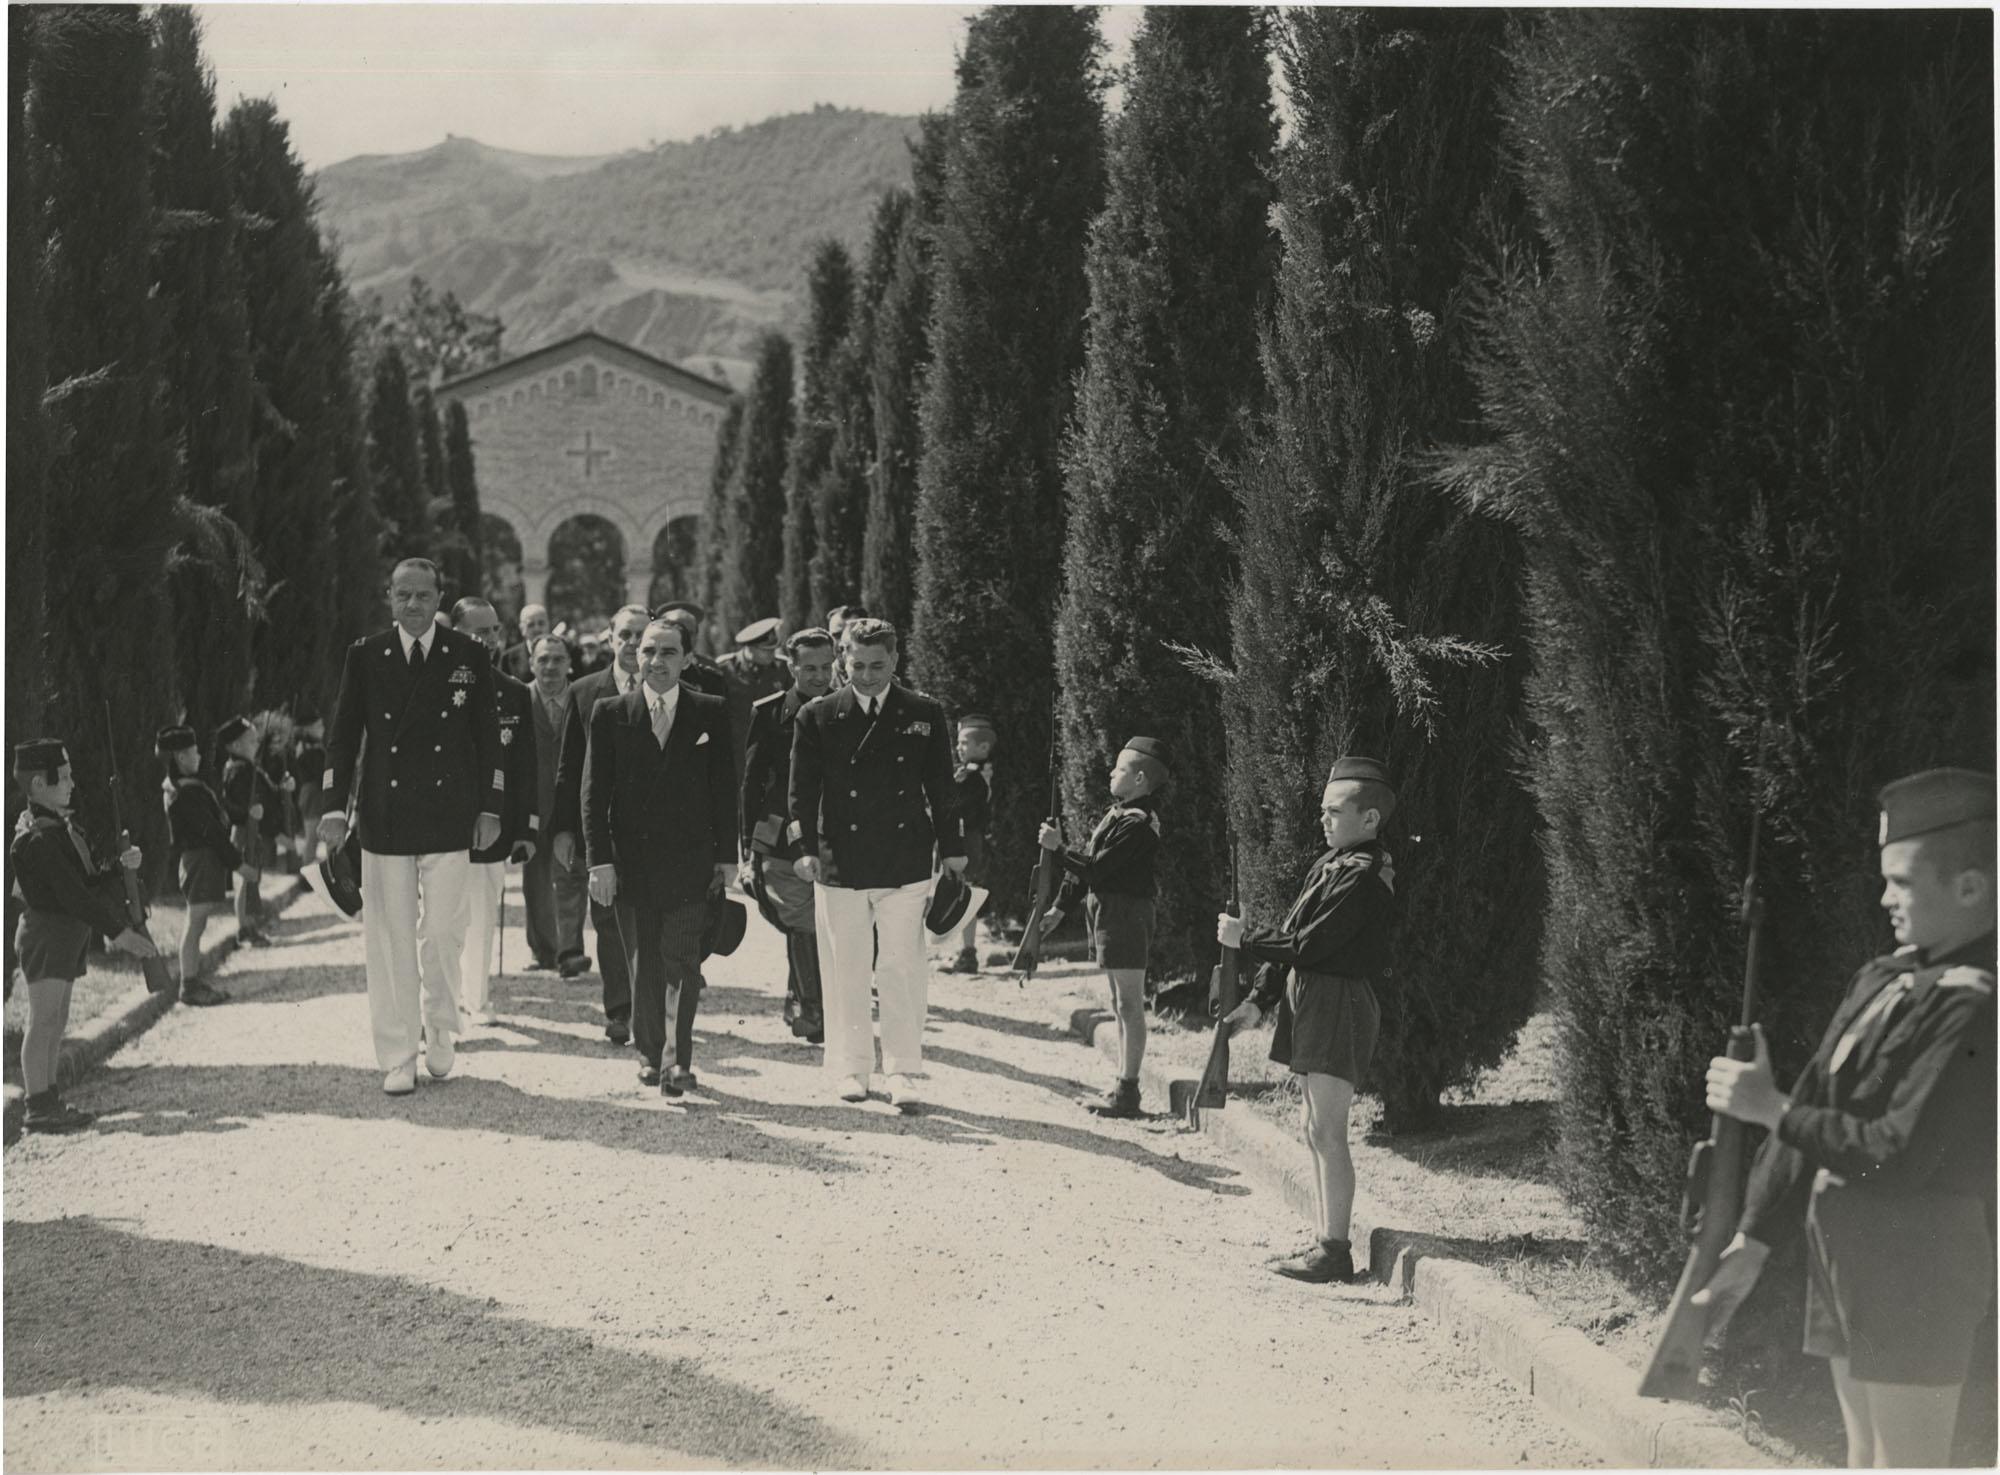 Mihai Antonescu's visit to Benito Mussolini, Photograph 27